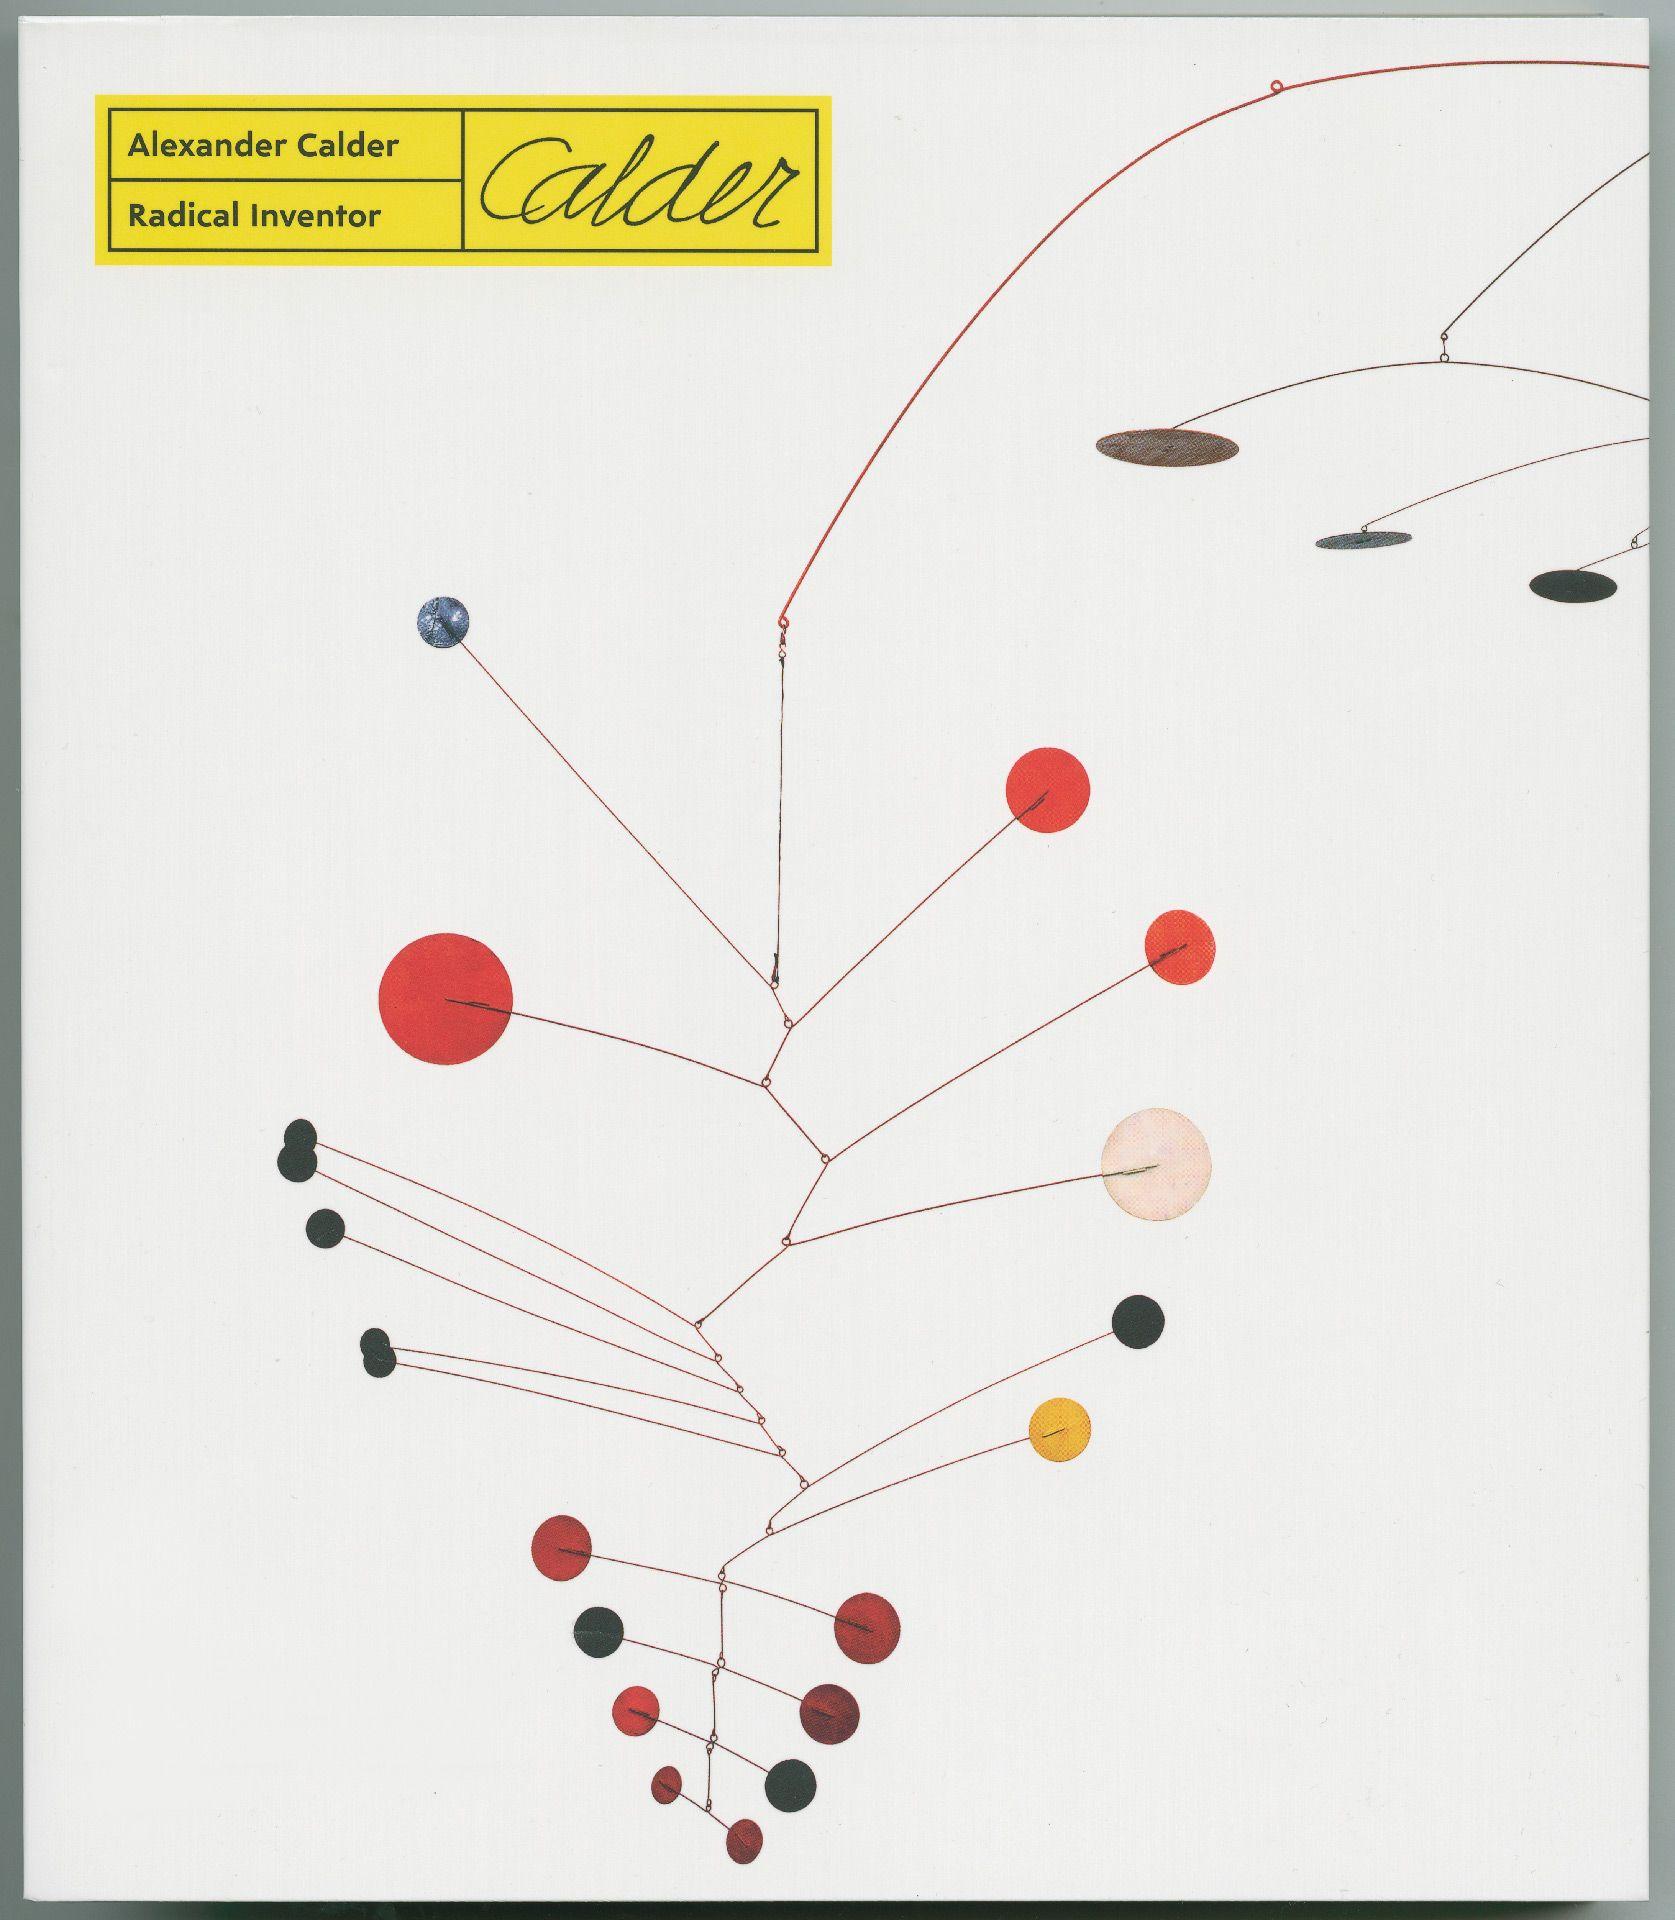 Cover of the book Alexander Calder: Radical Inventor